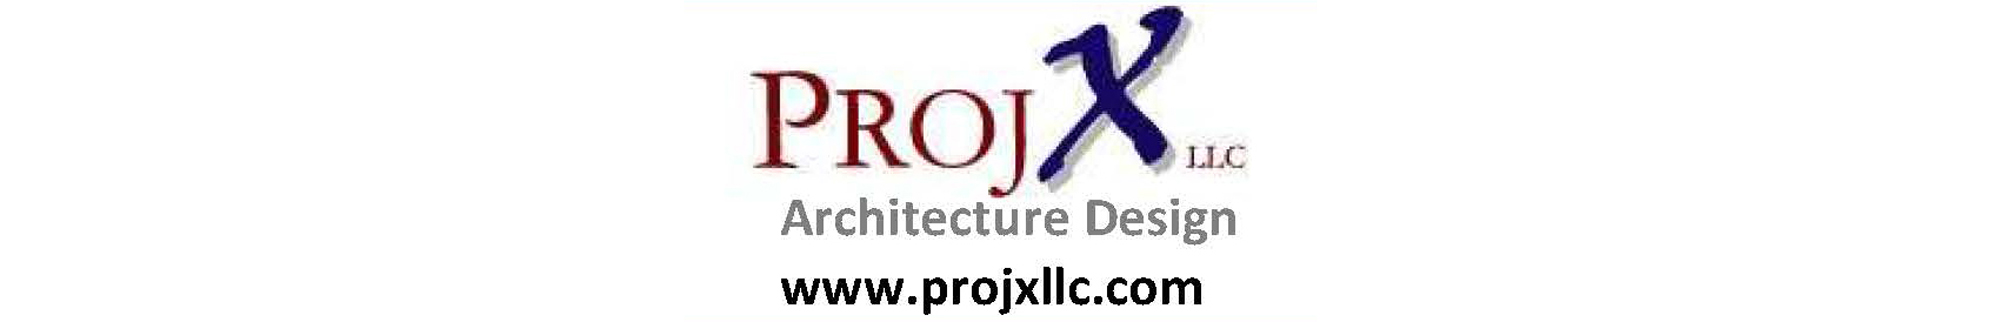 ProjX Logo LONG.jpg